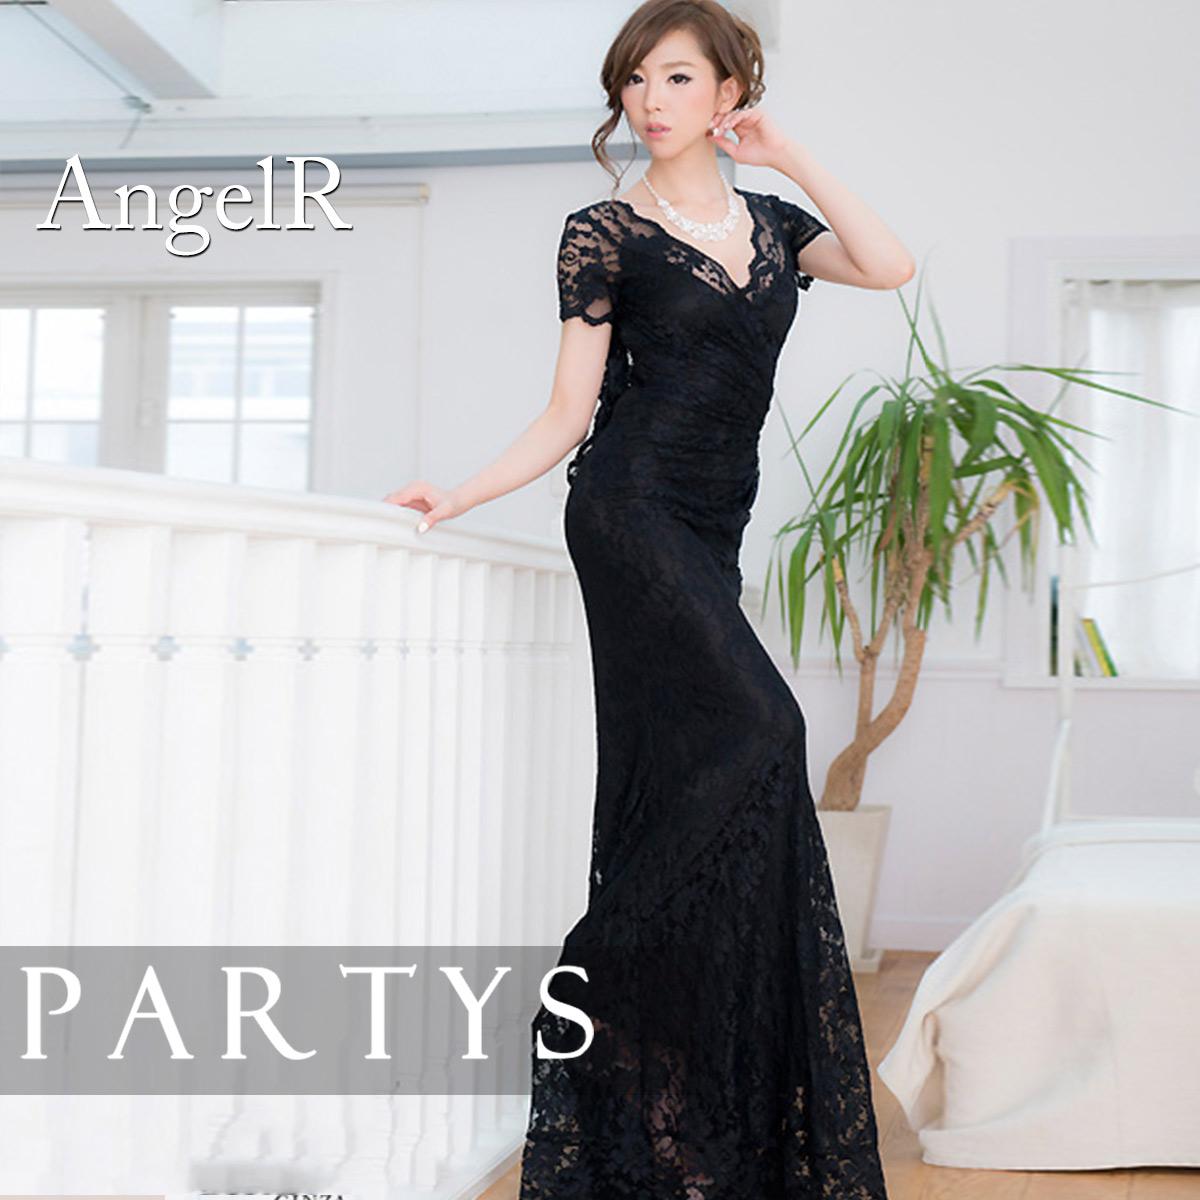 34c86210cebd2 送料無料       Angel R   背中ビジュー レース ドレス ロングドレス ...